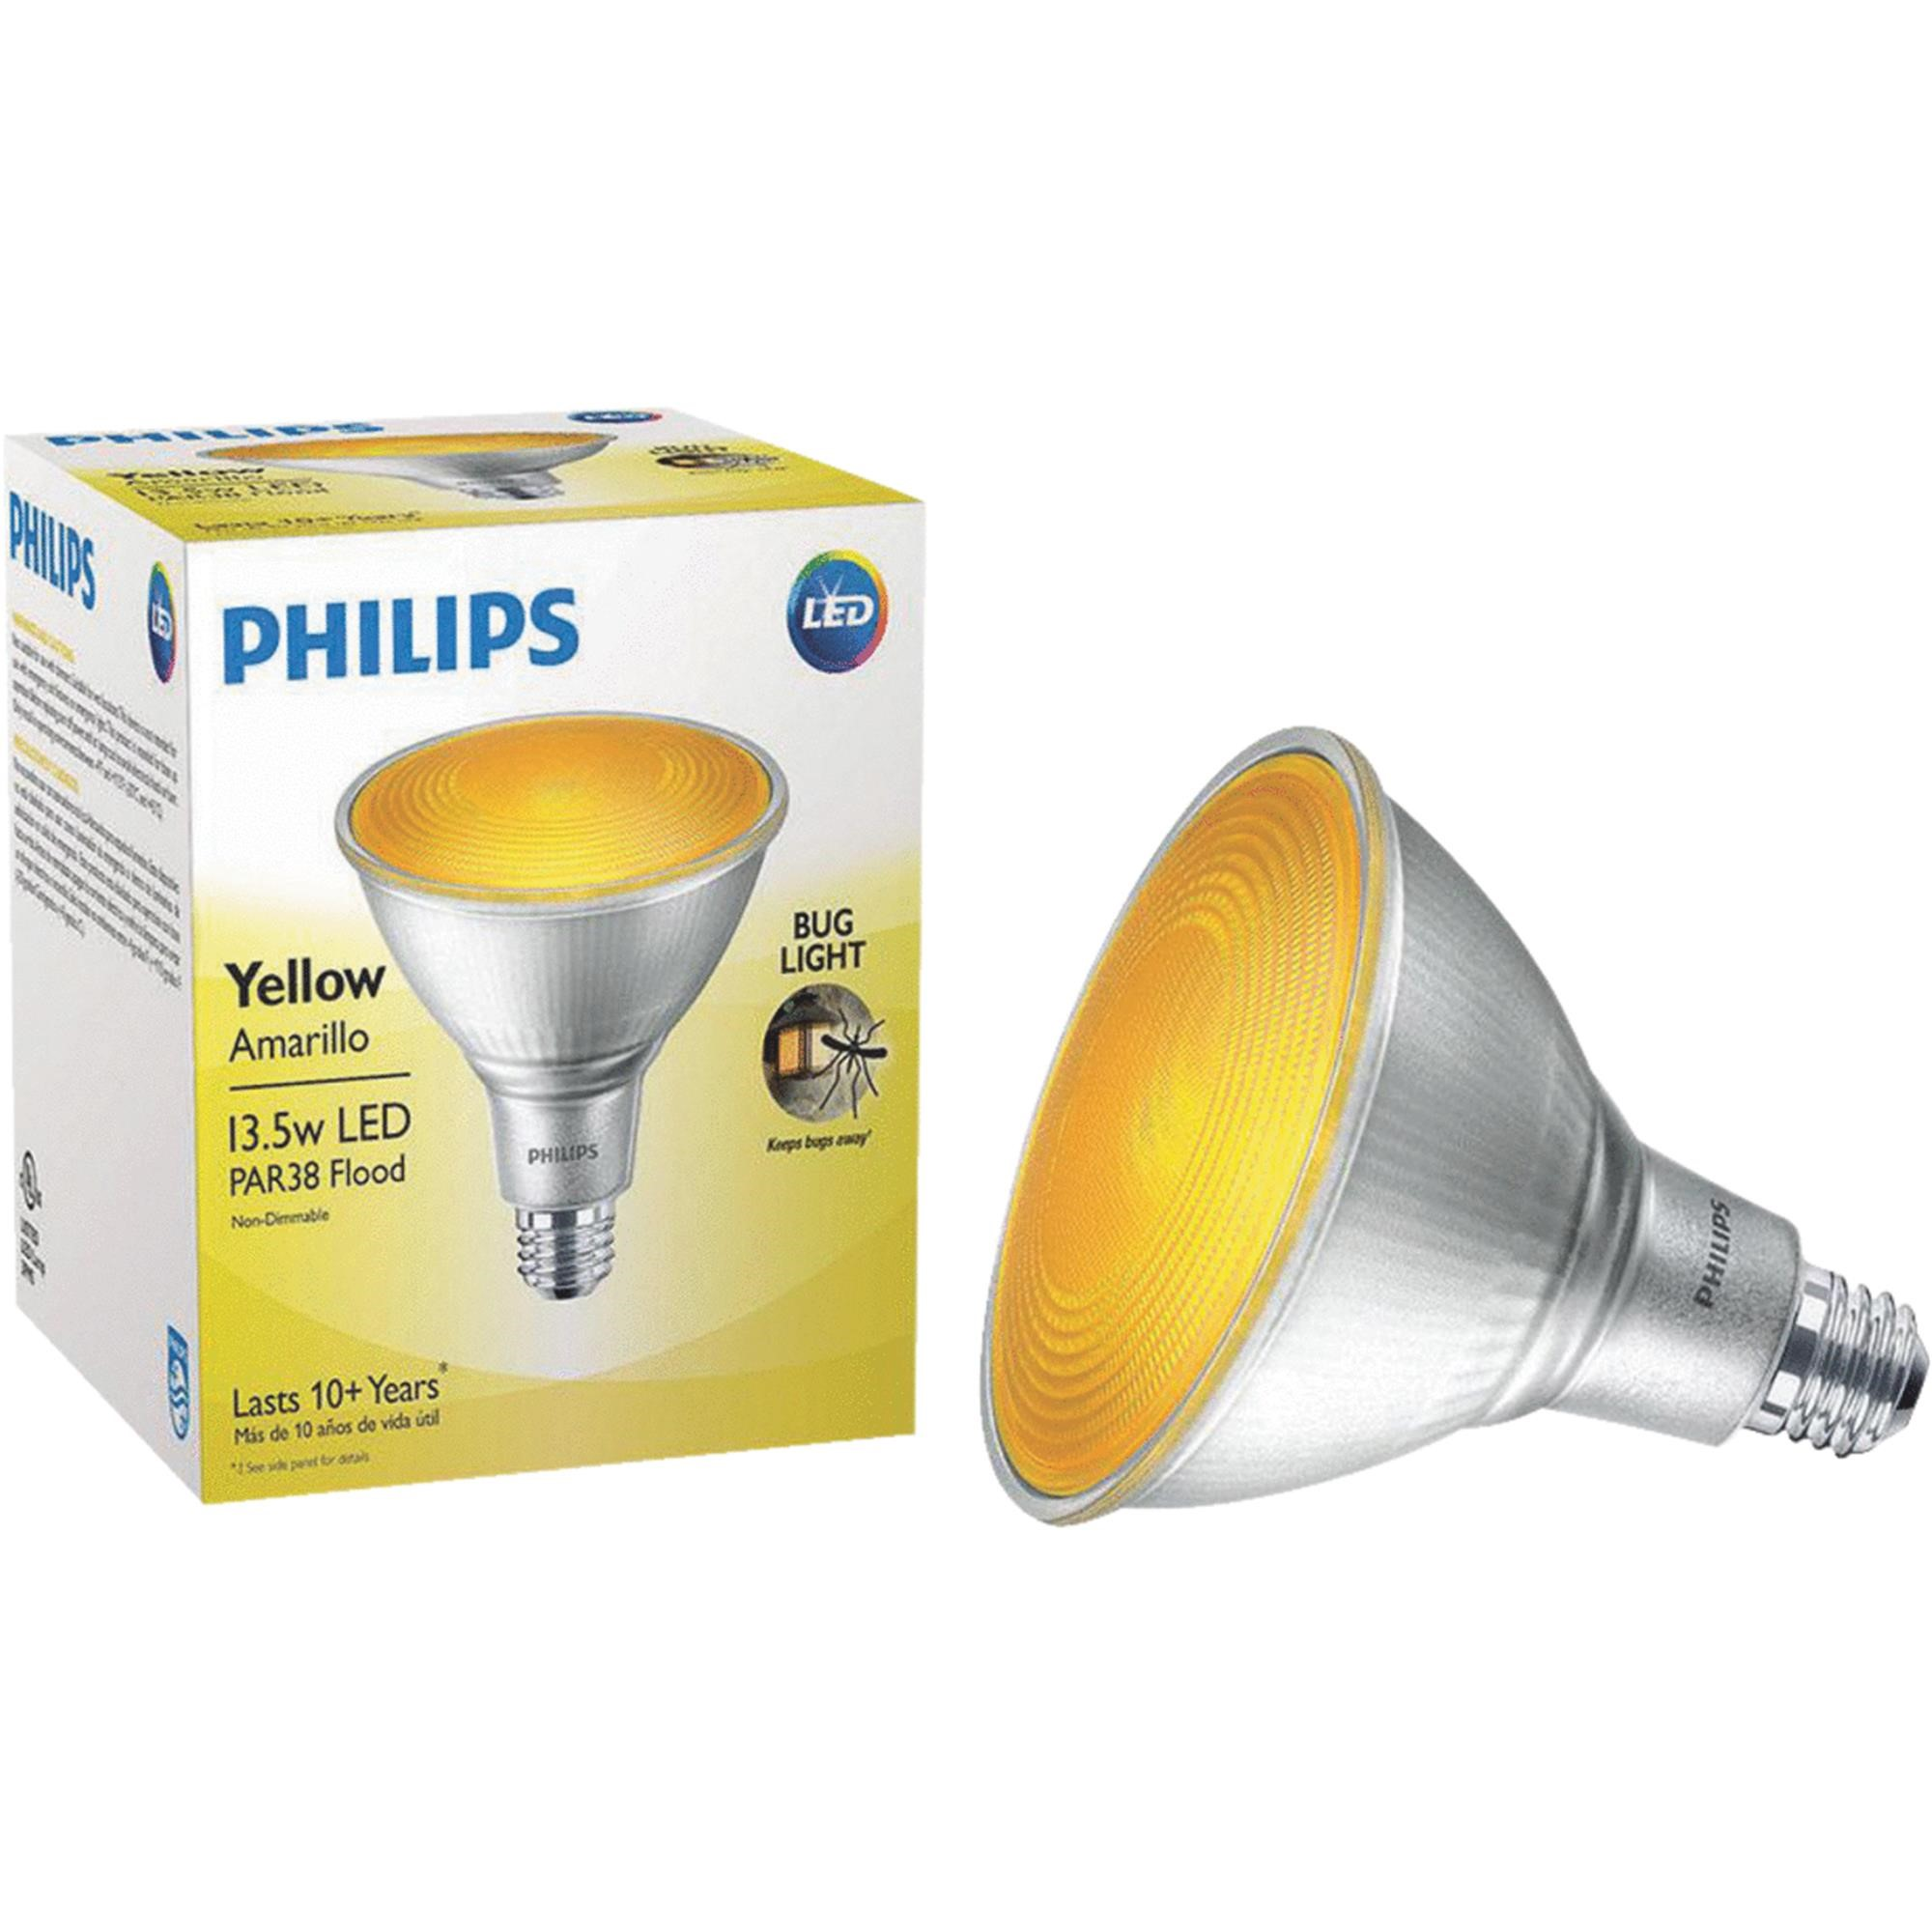 Philips PAR38 Medium LED Bug Light Bulb